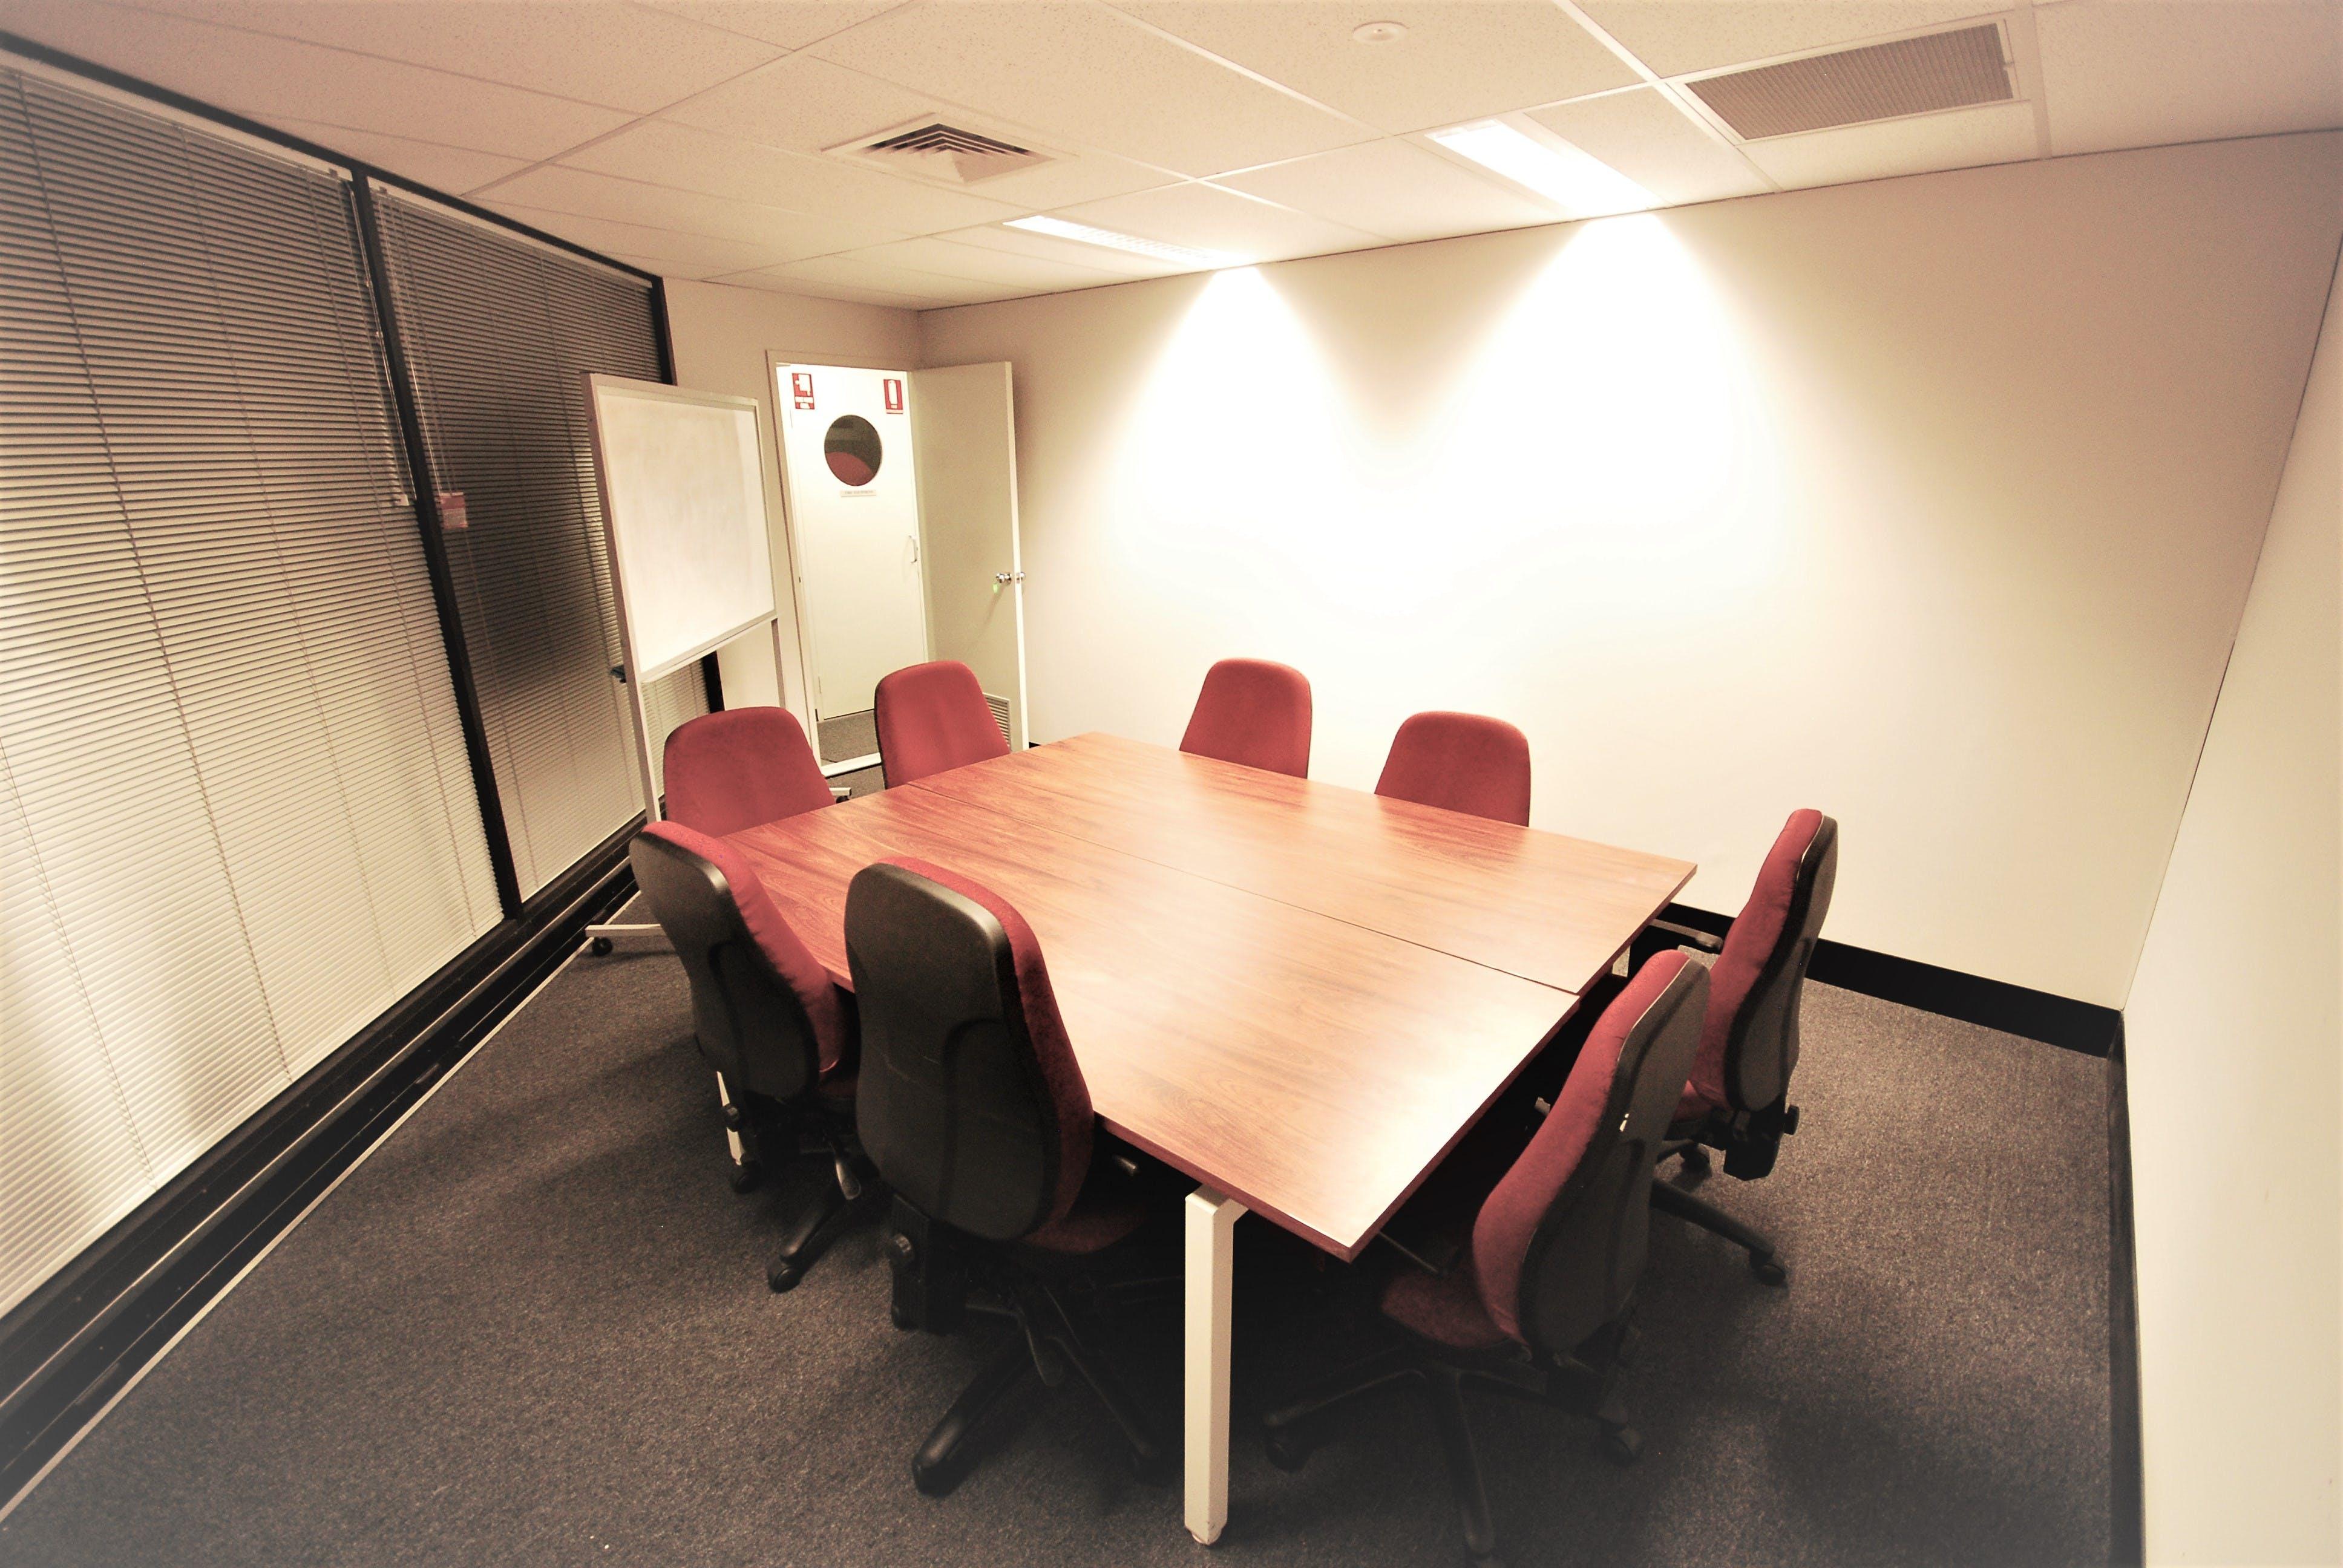 Boardroom/Training Room, meeting room at Sitting Rooms, image 1